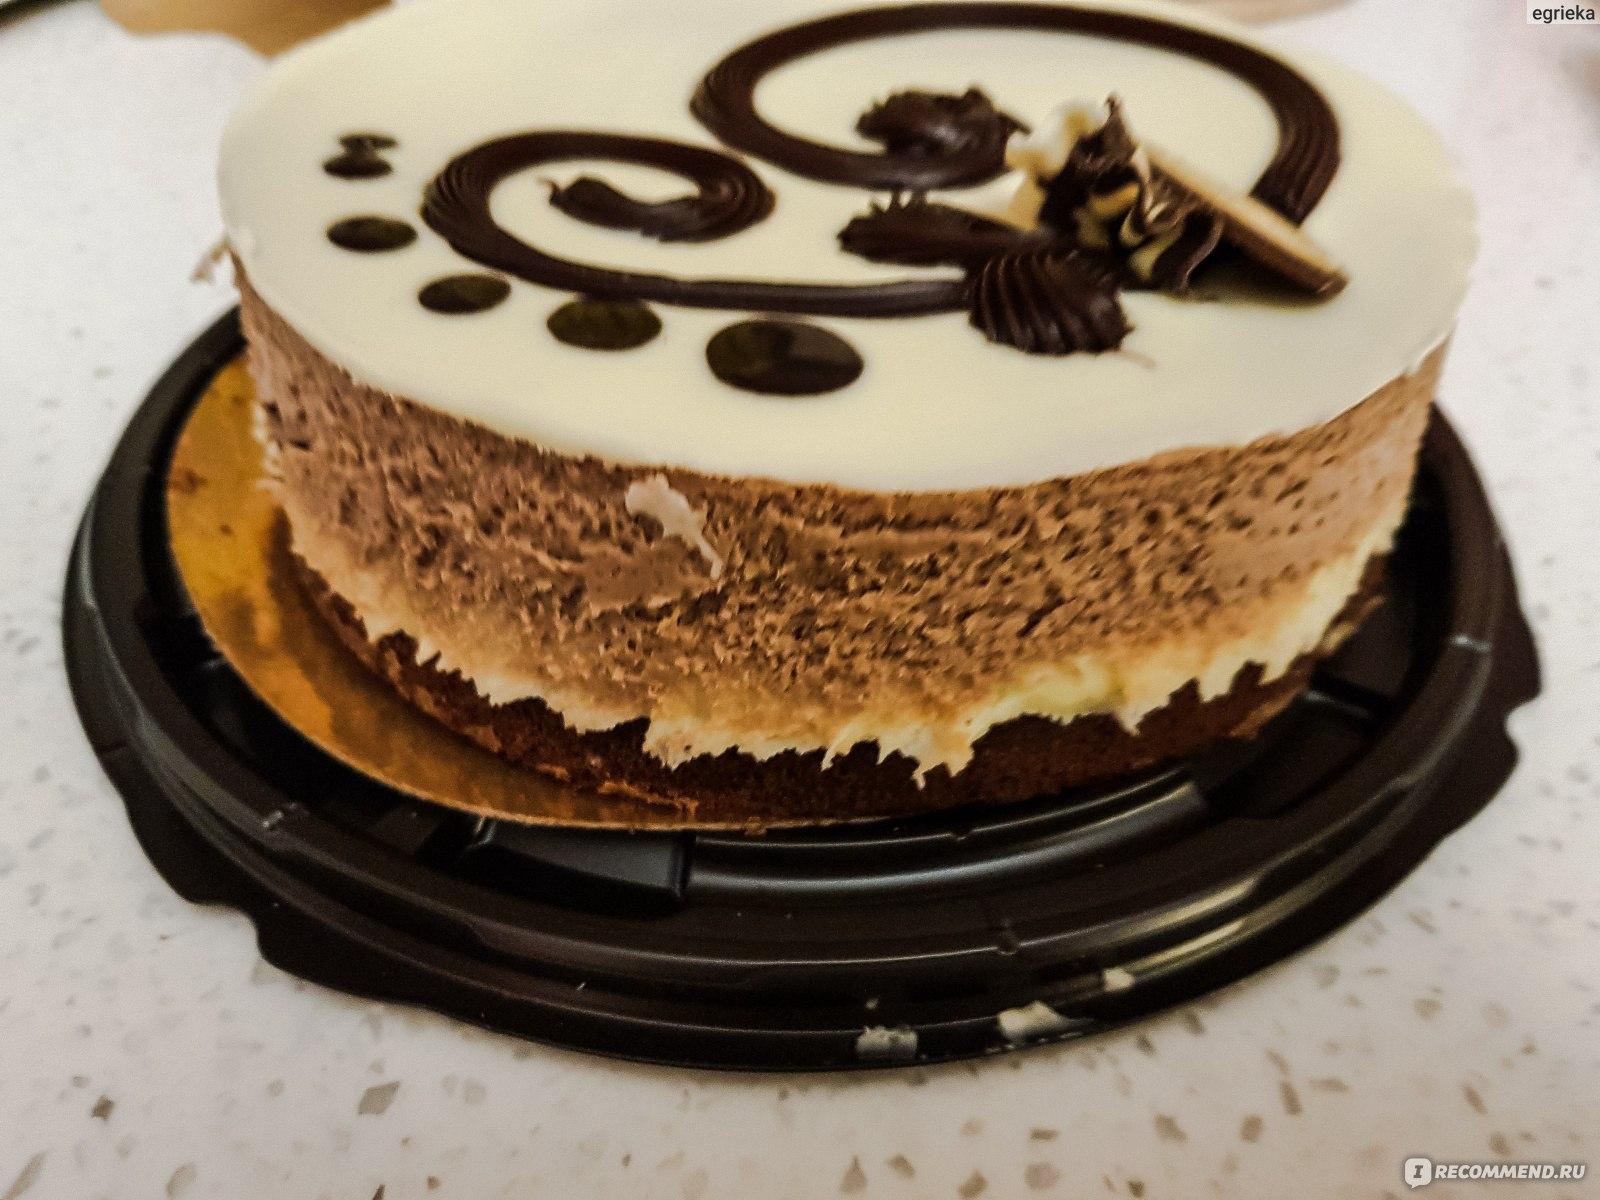 торт три шоколада мирель рецепт с фото эластичности прочности